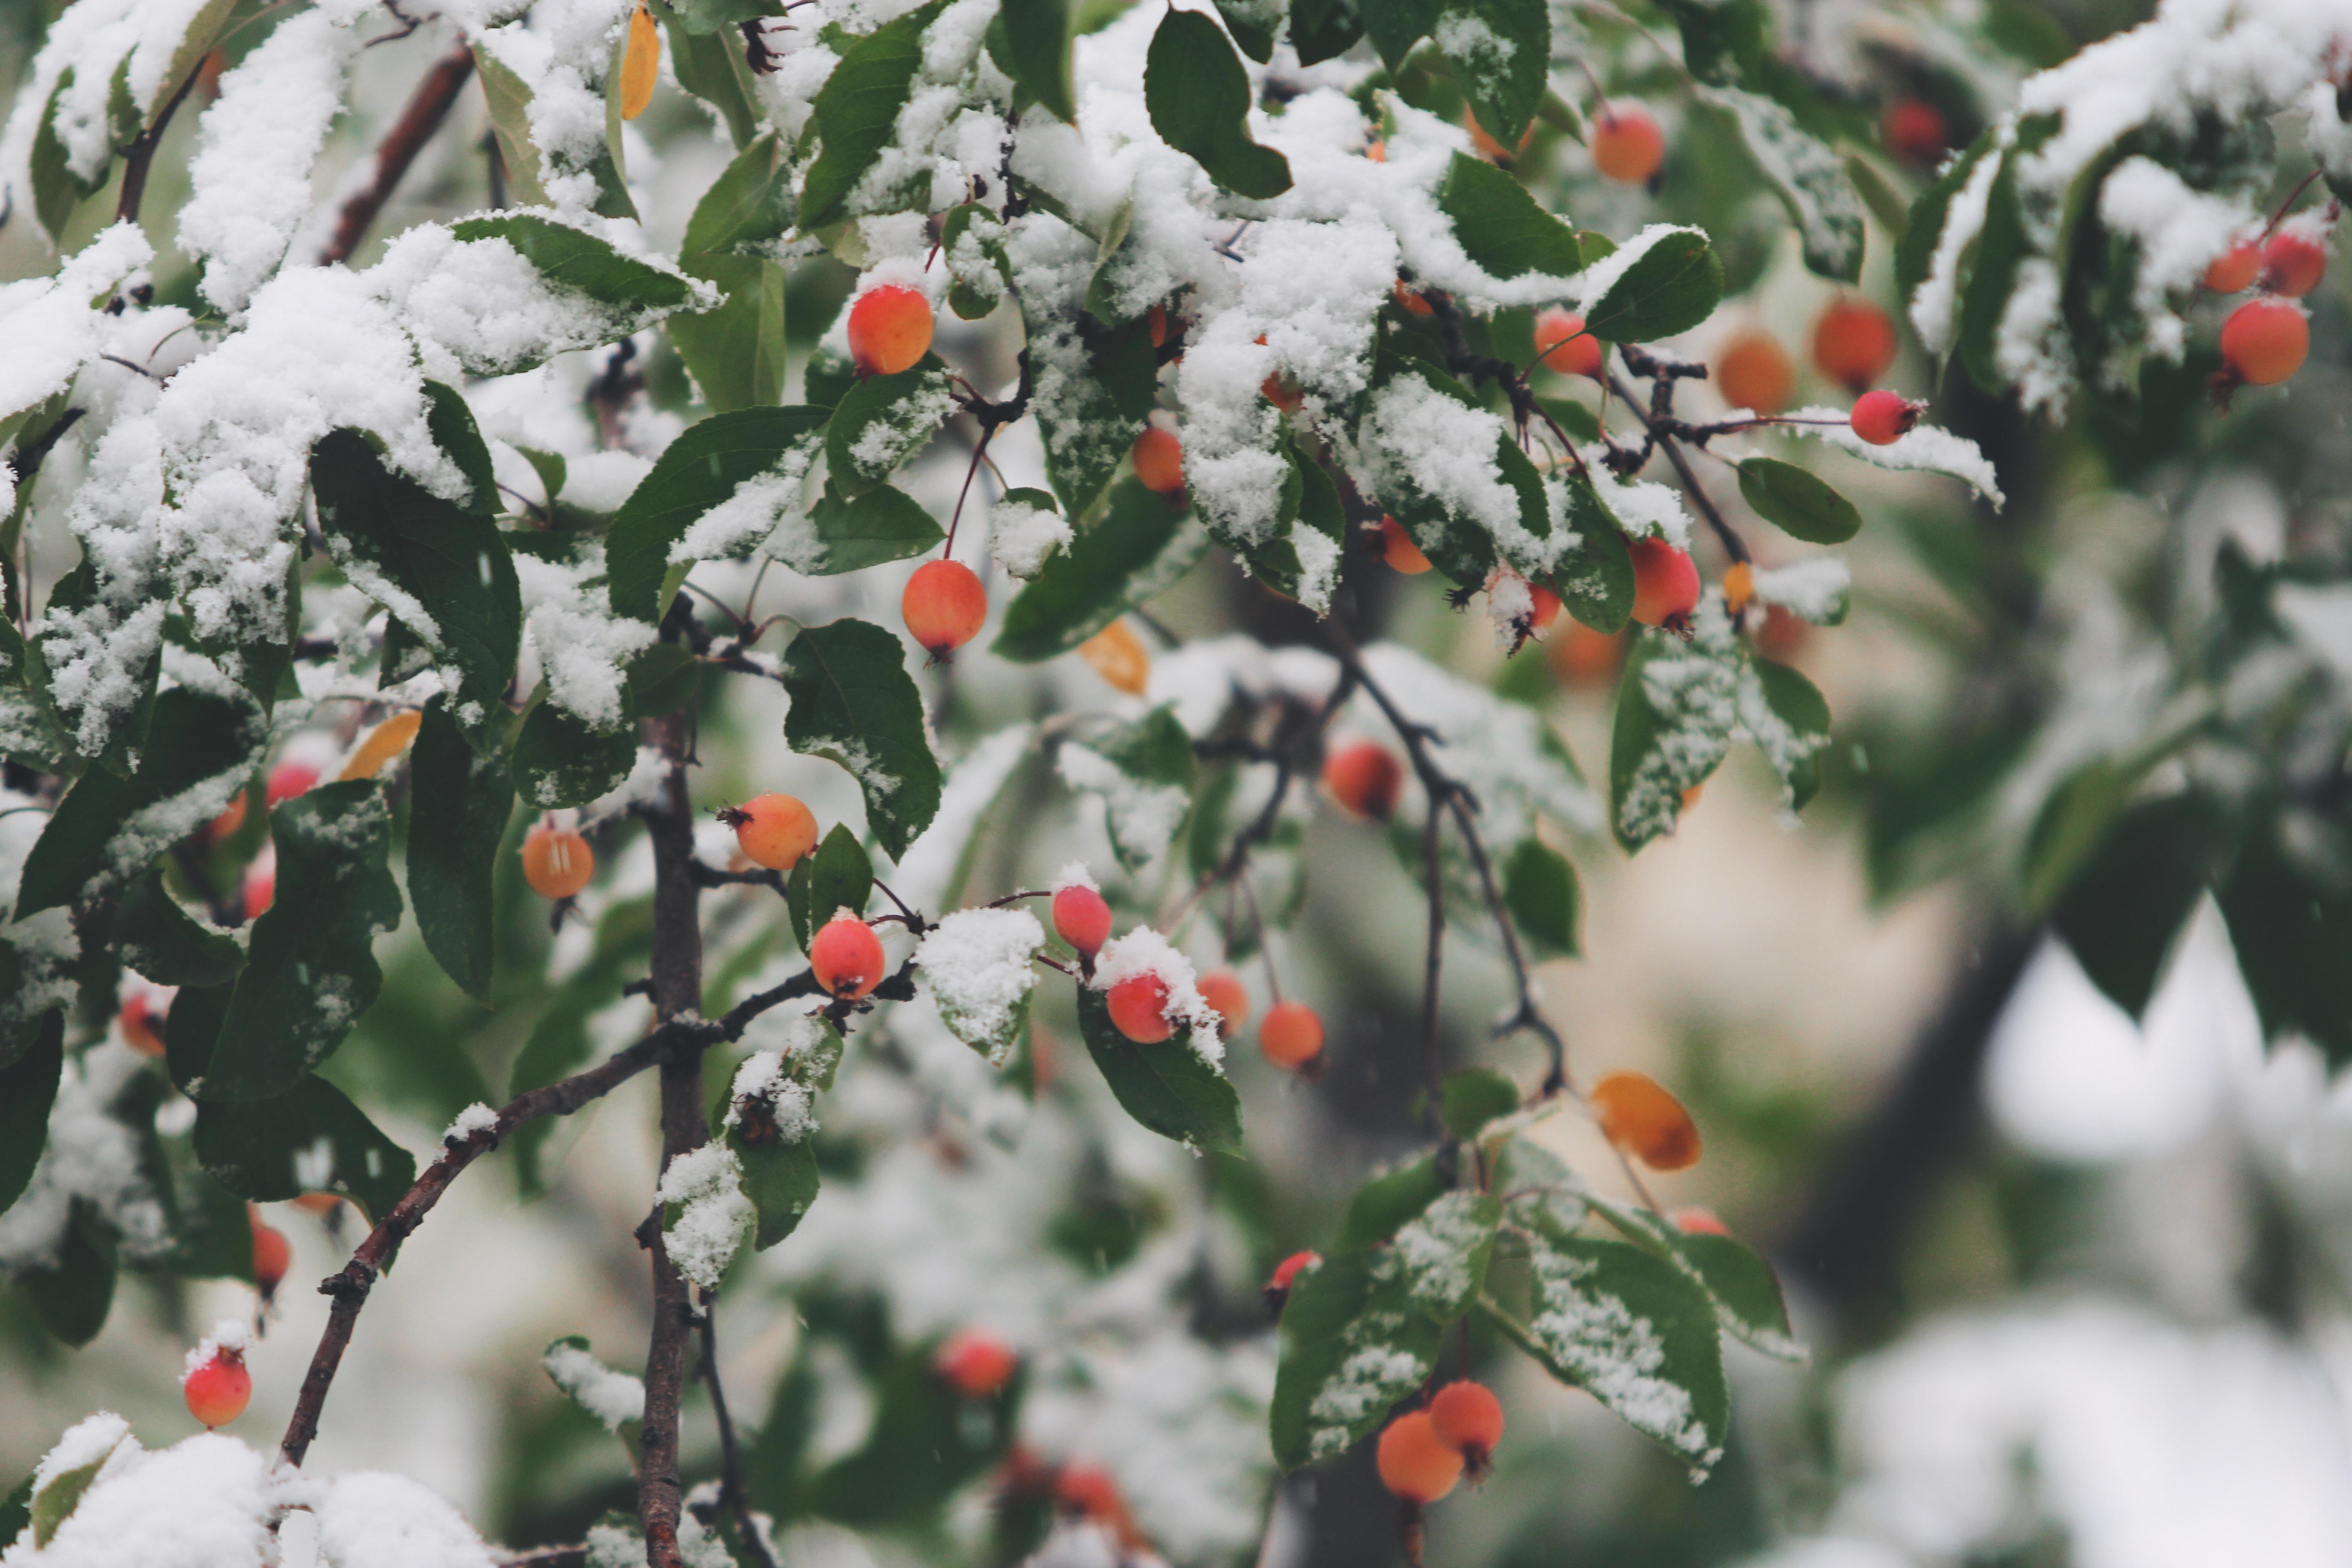 Wild Berries, Berries, Fruit, Snow, Tree, HQ Photo